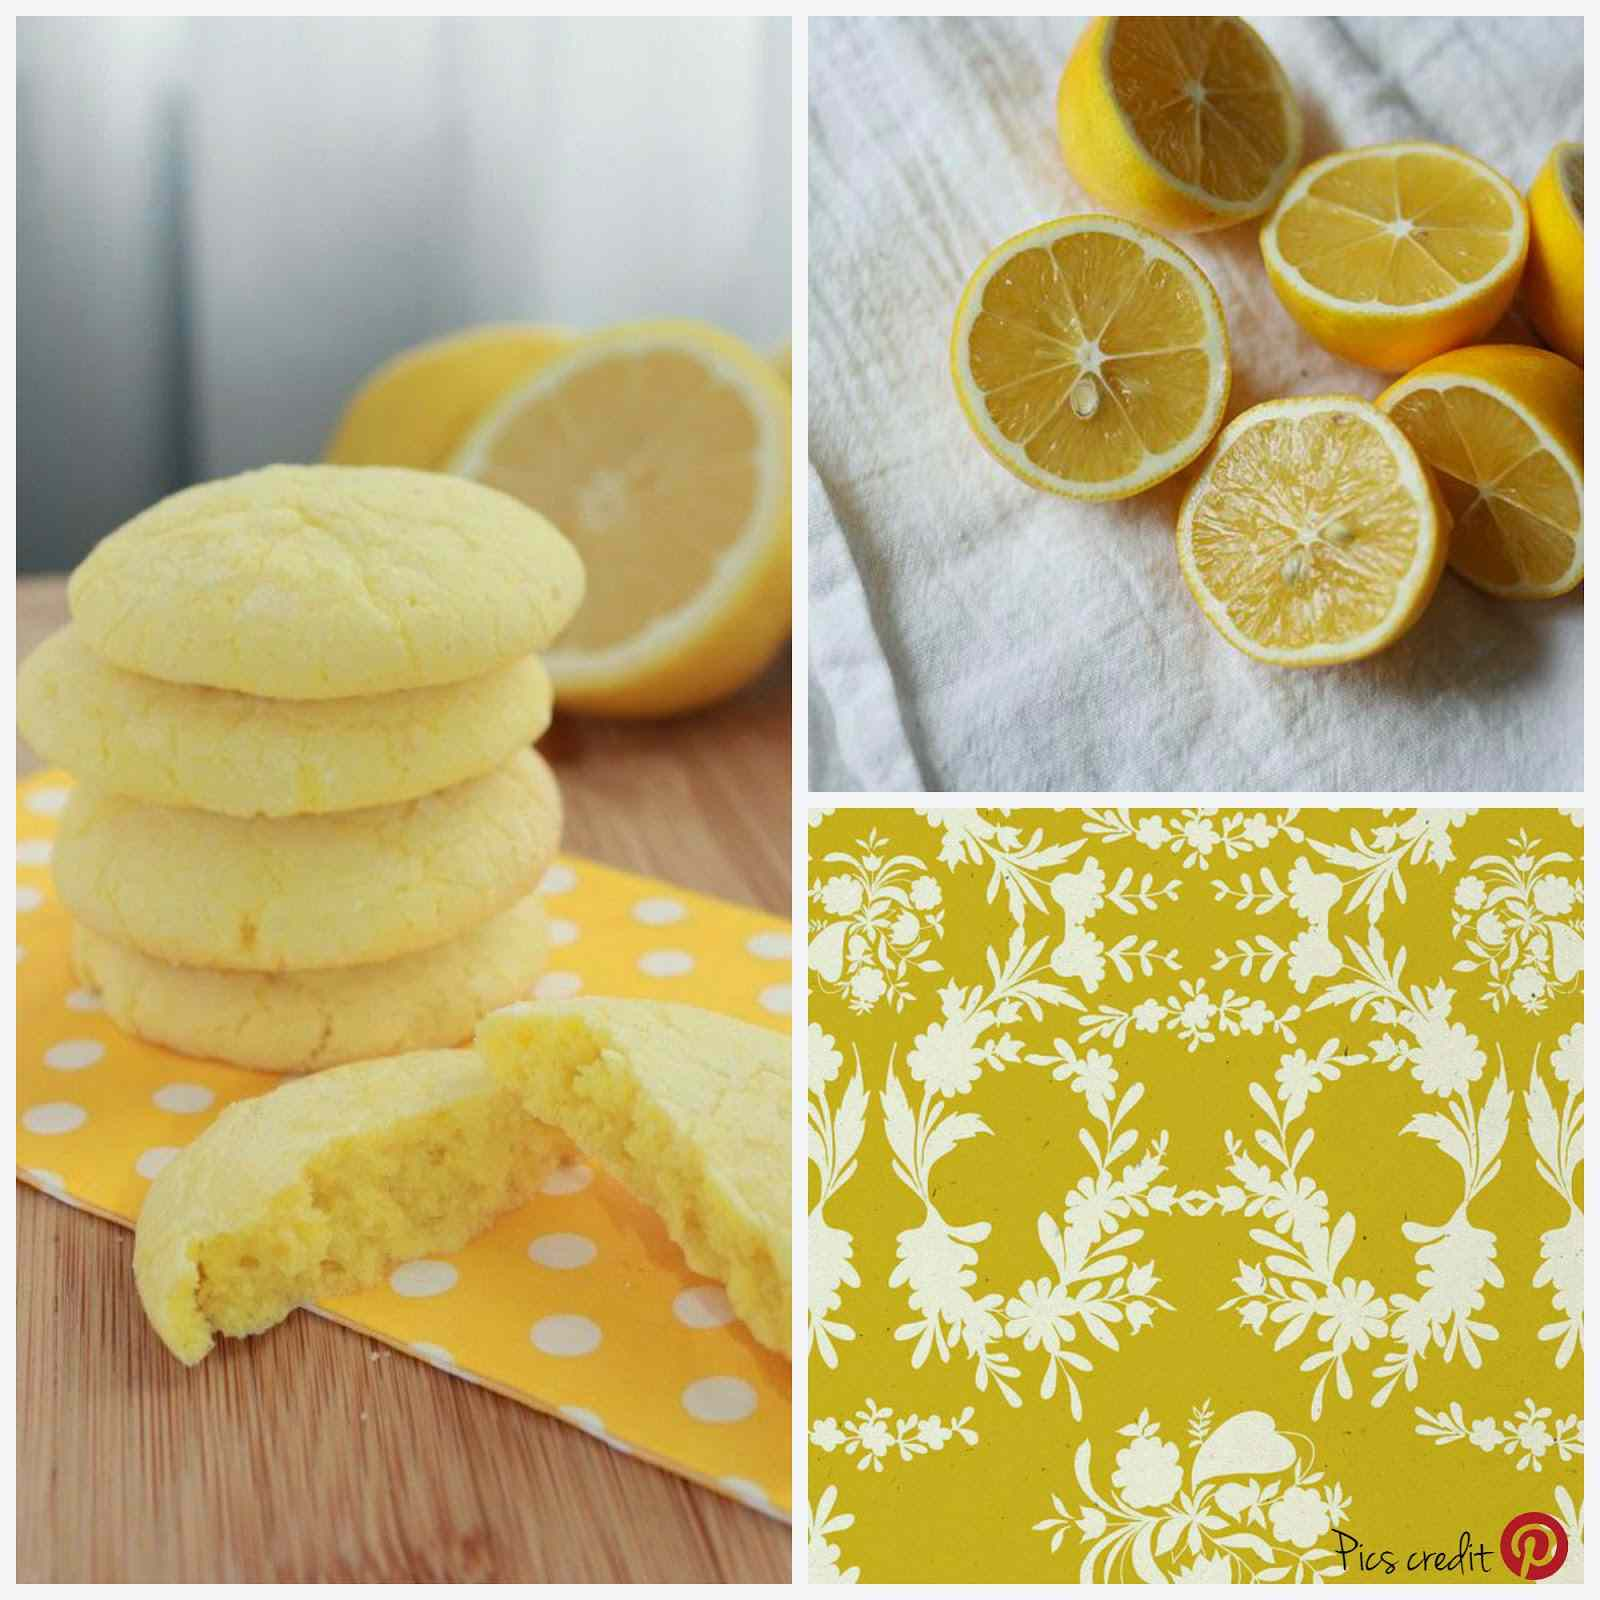 Ricetta: Biscotti morbidi al limone / soft lemon cookies